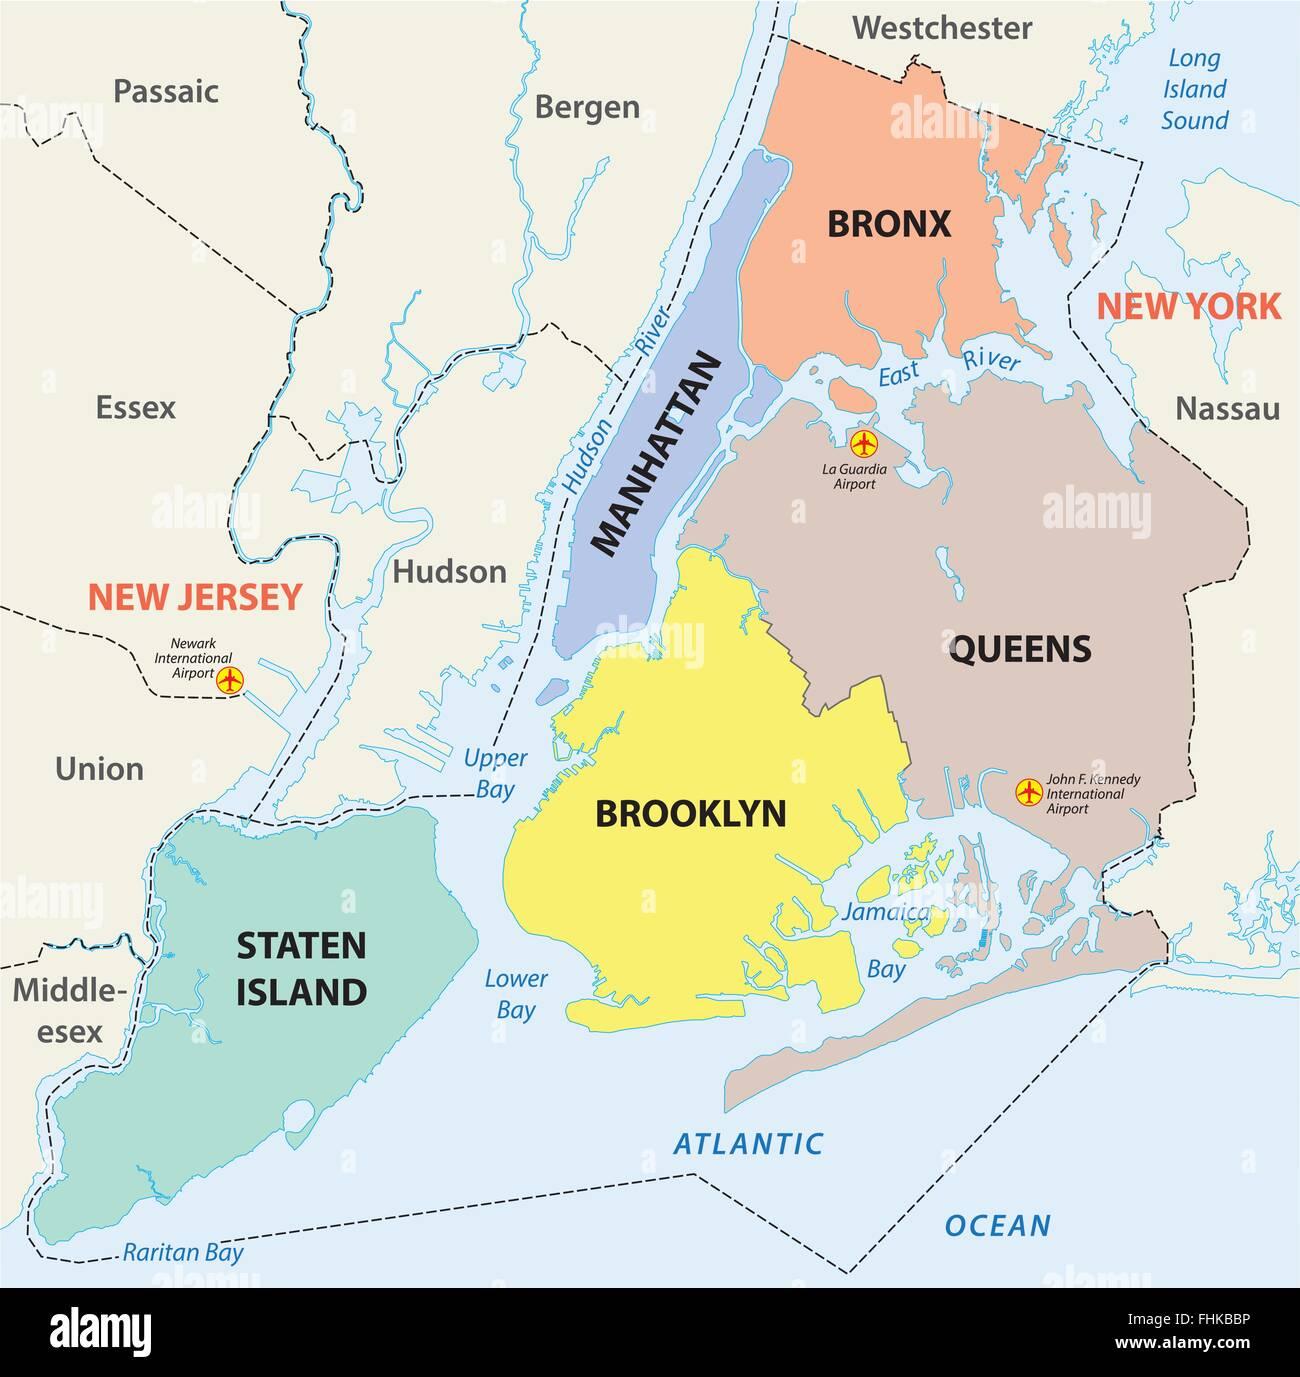 New York City 5 Boroughs Map Stock Vector Art